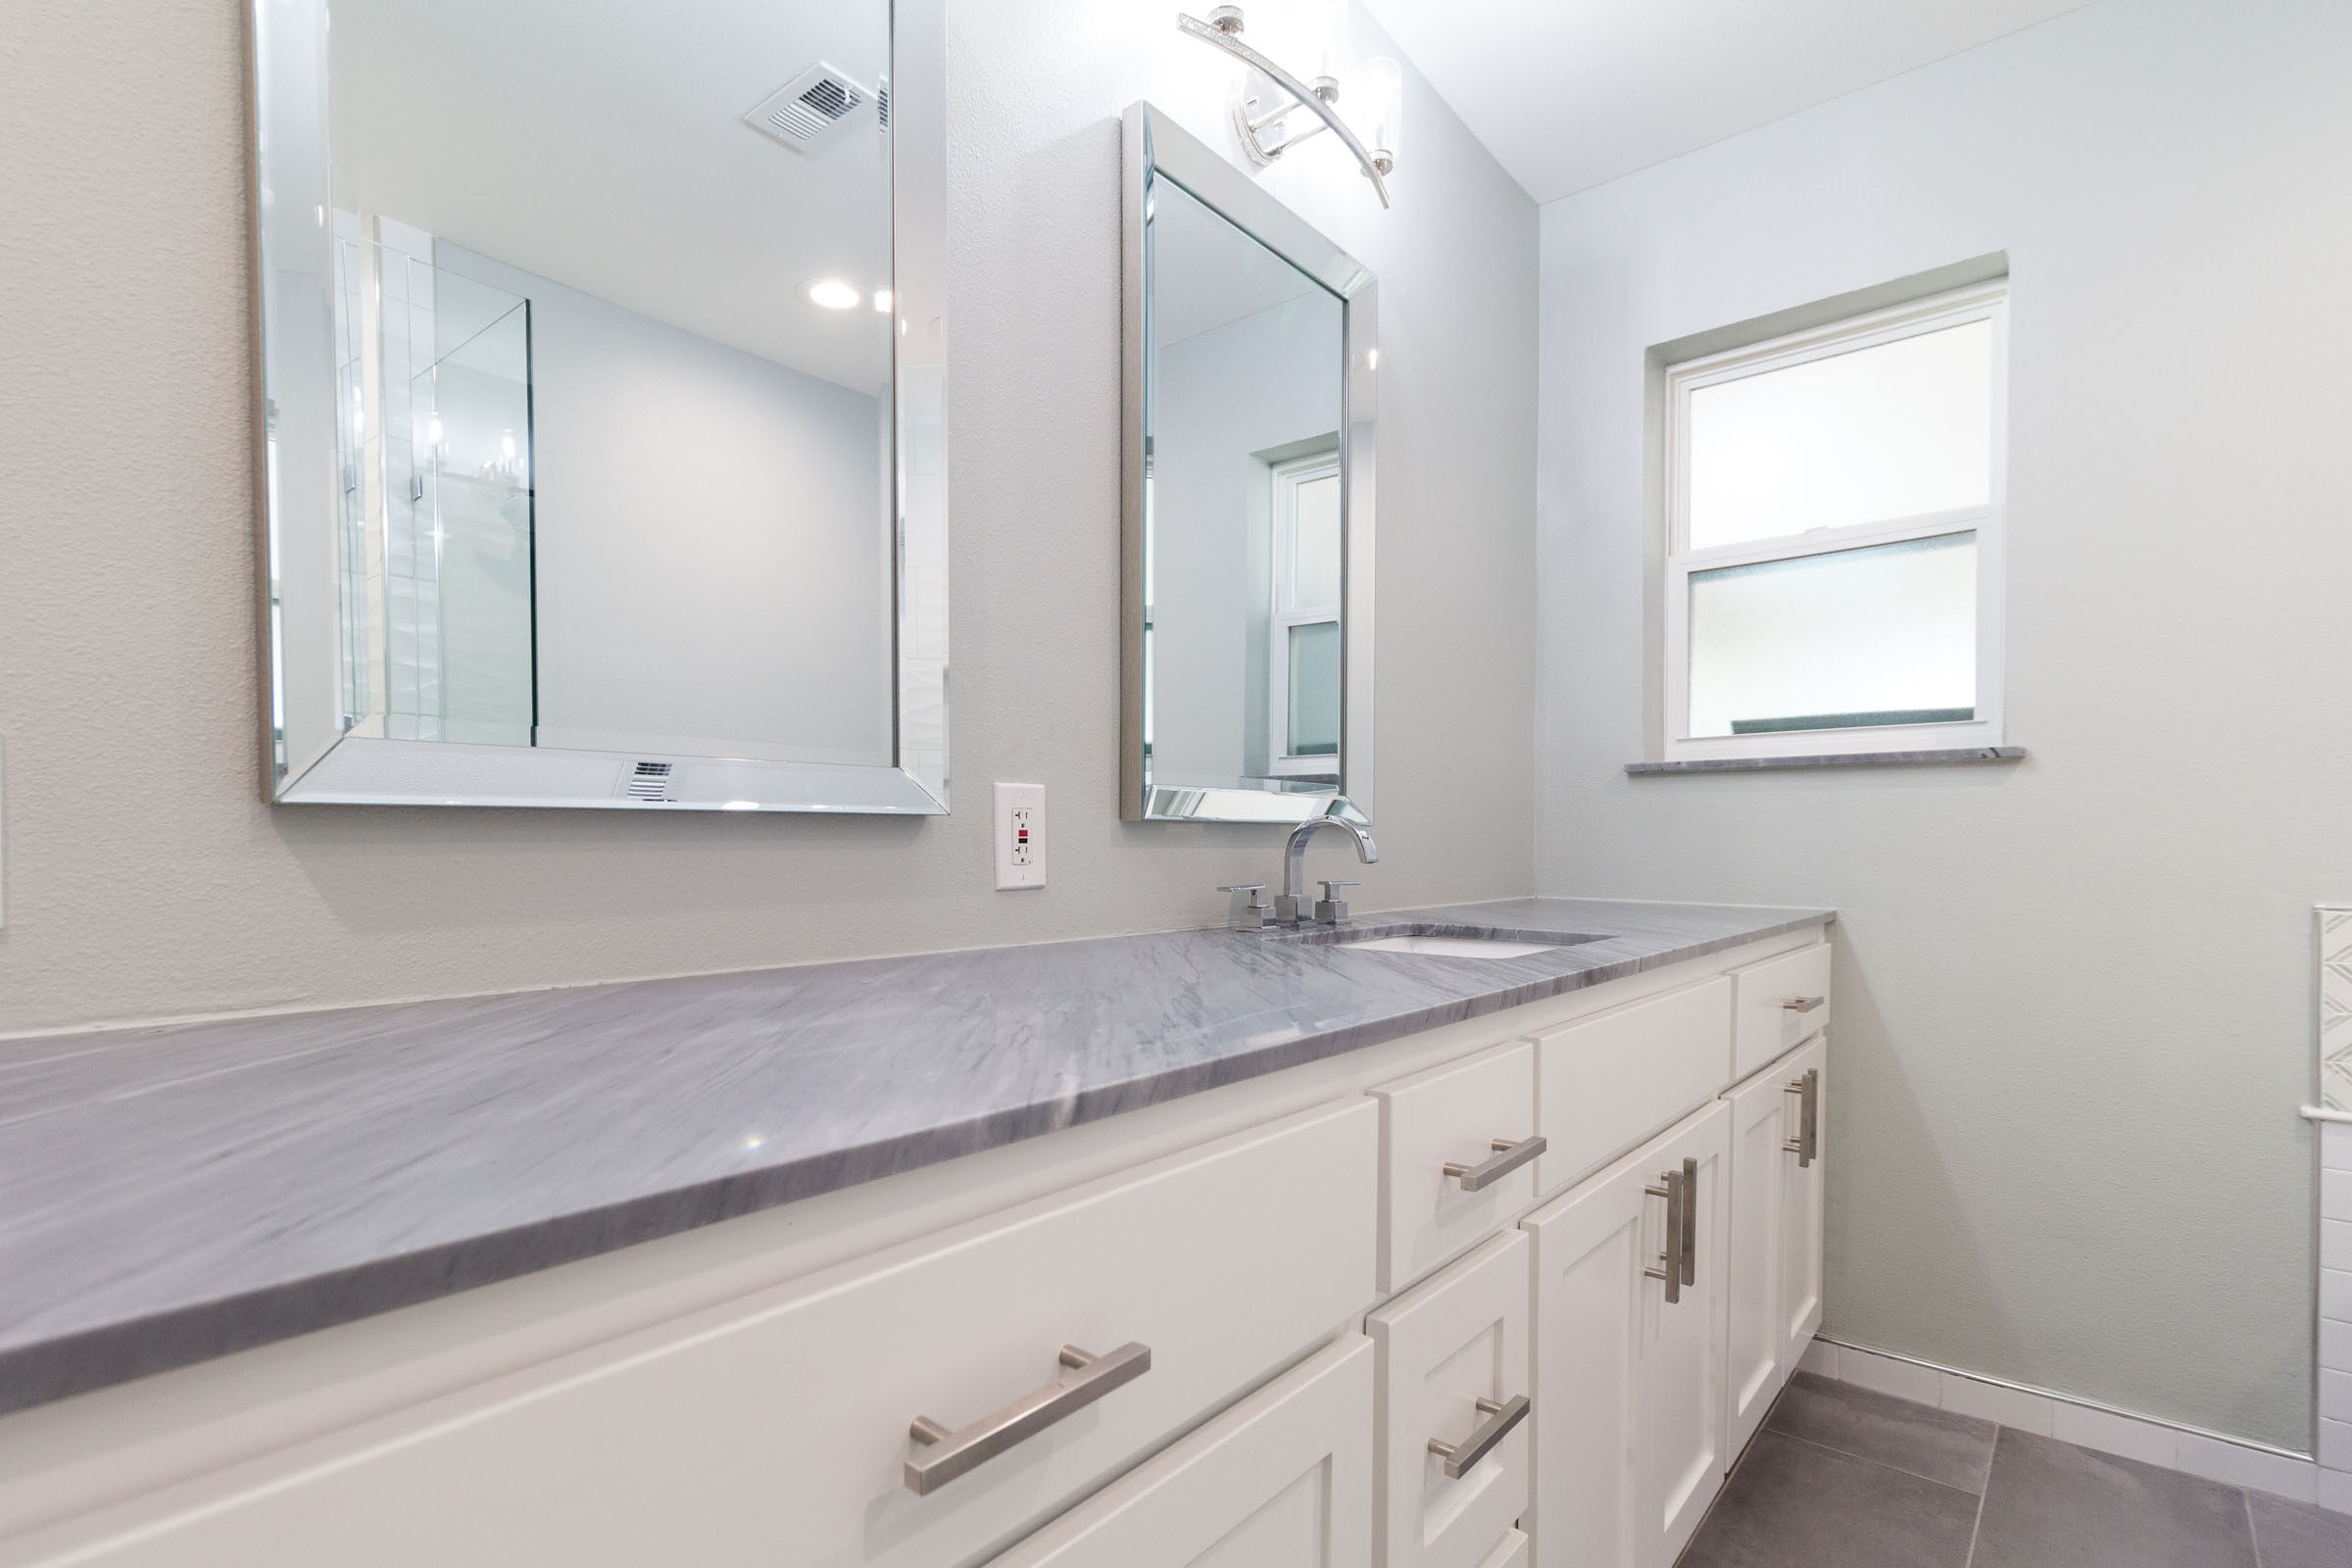 Bathroom remodel, twin mirrors, white shaker cabinets, grey granite, window, dark grey tile